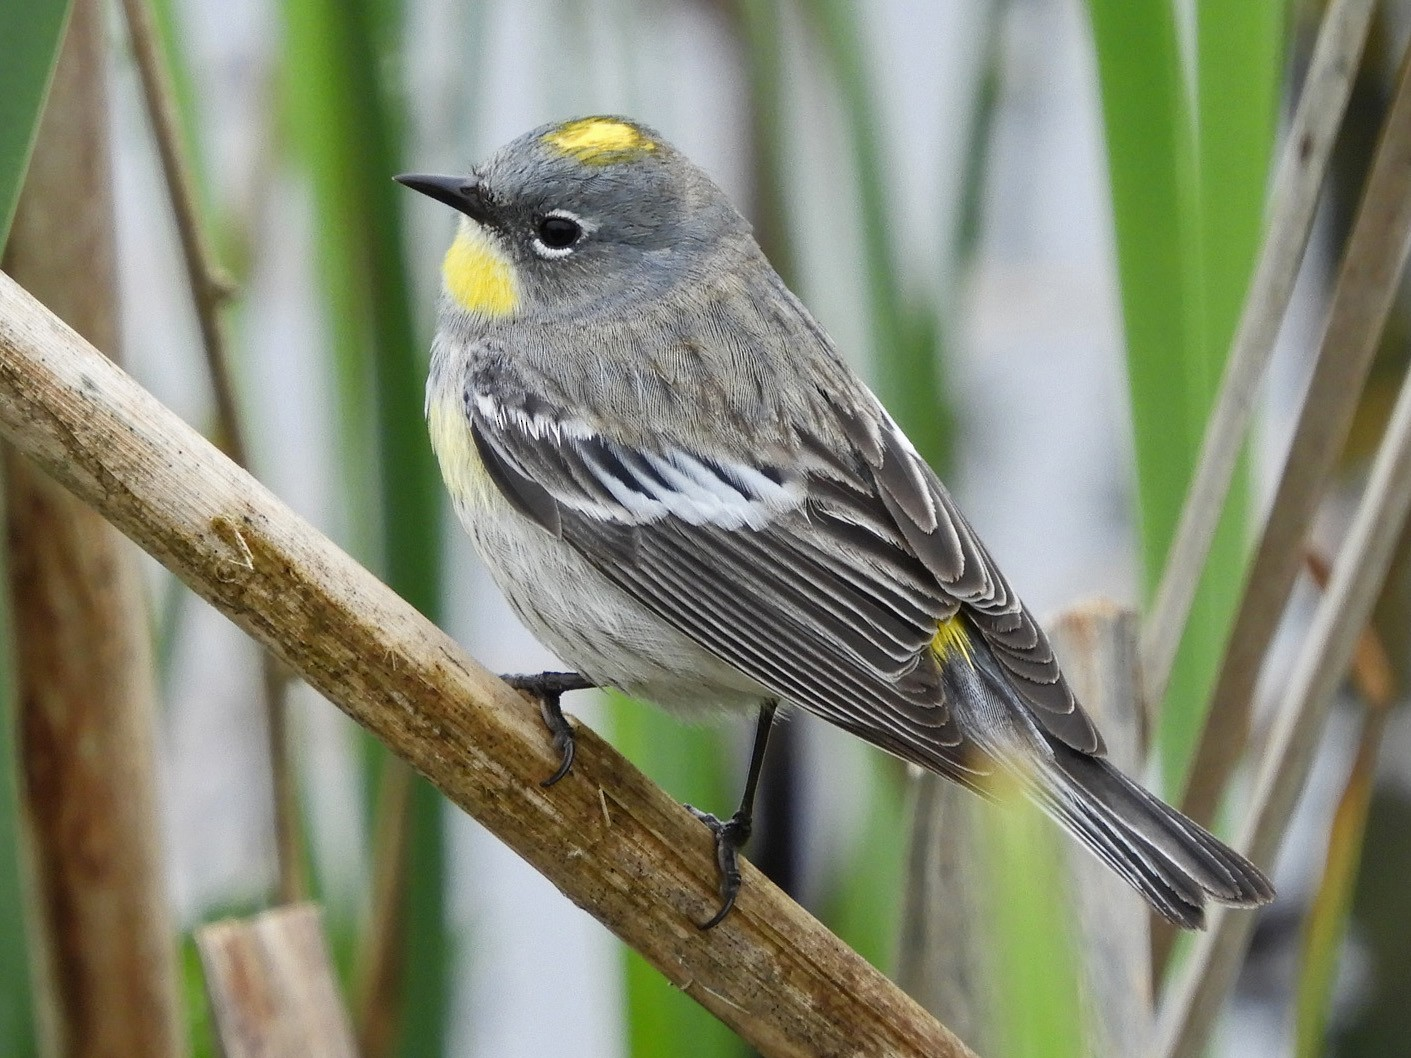 Yellow-rumped Warbler - Georgia Gerrior